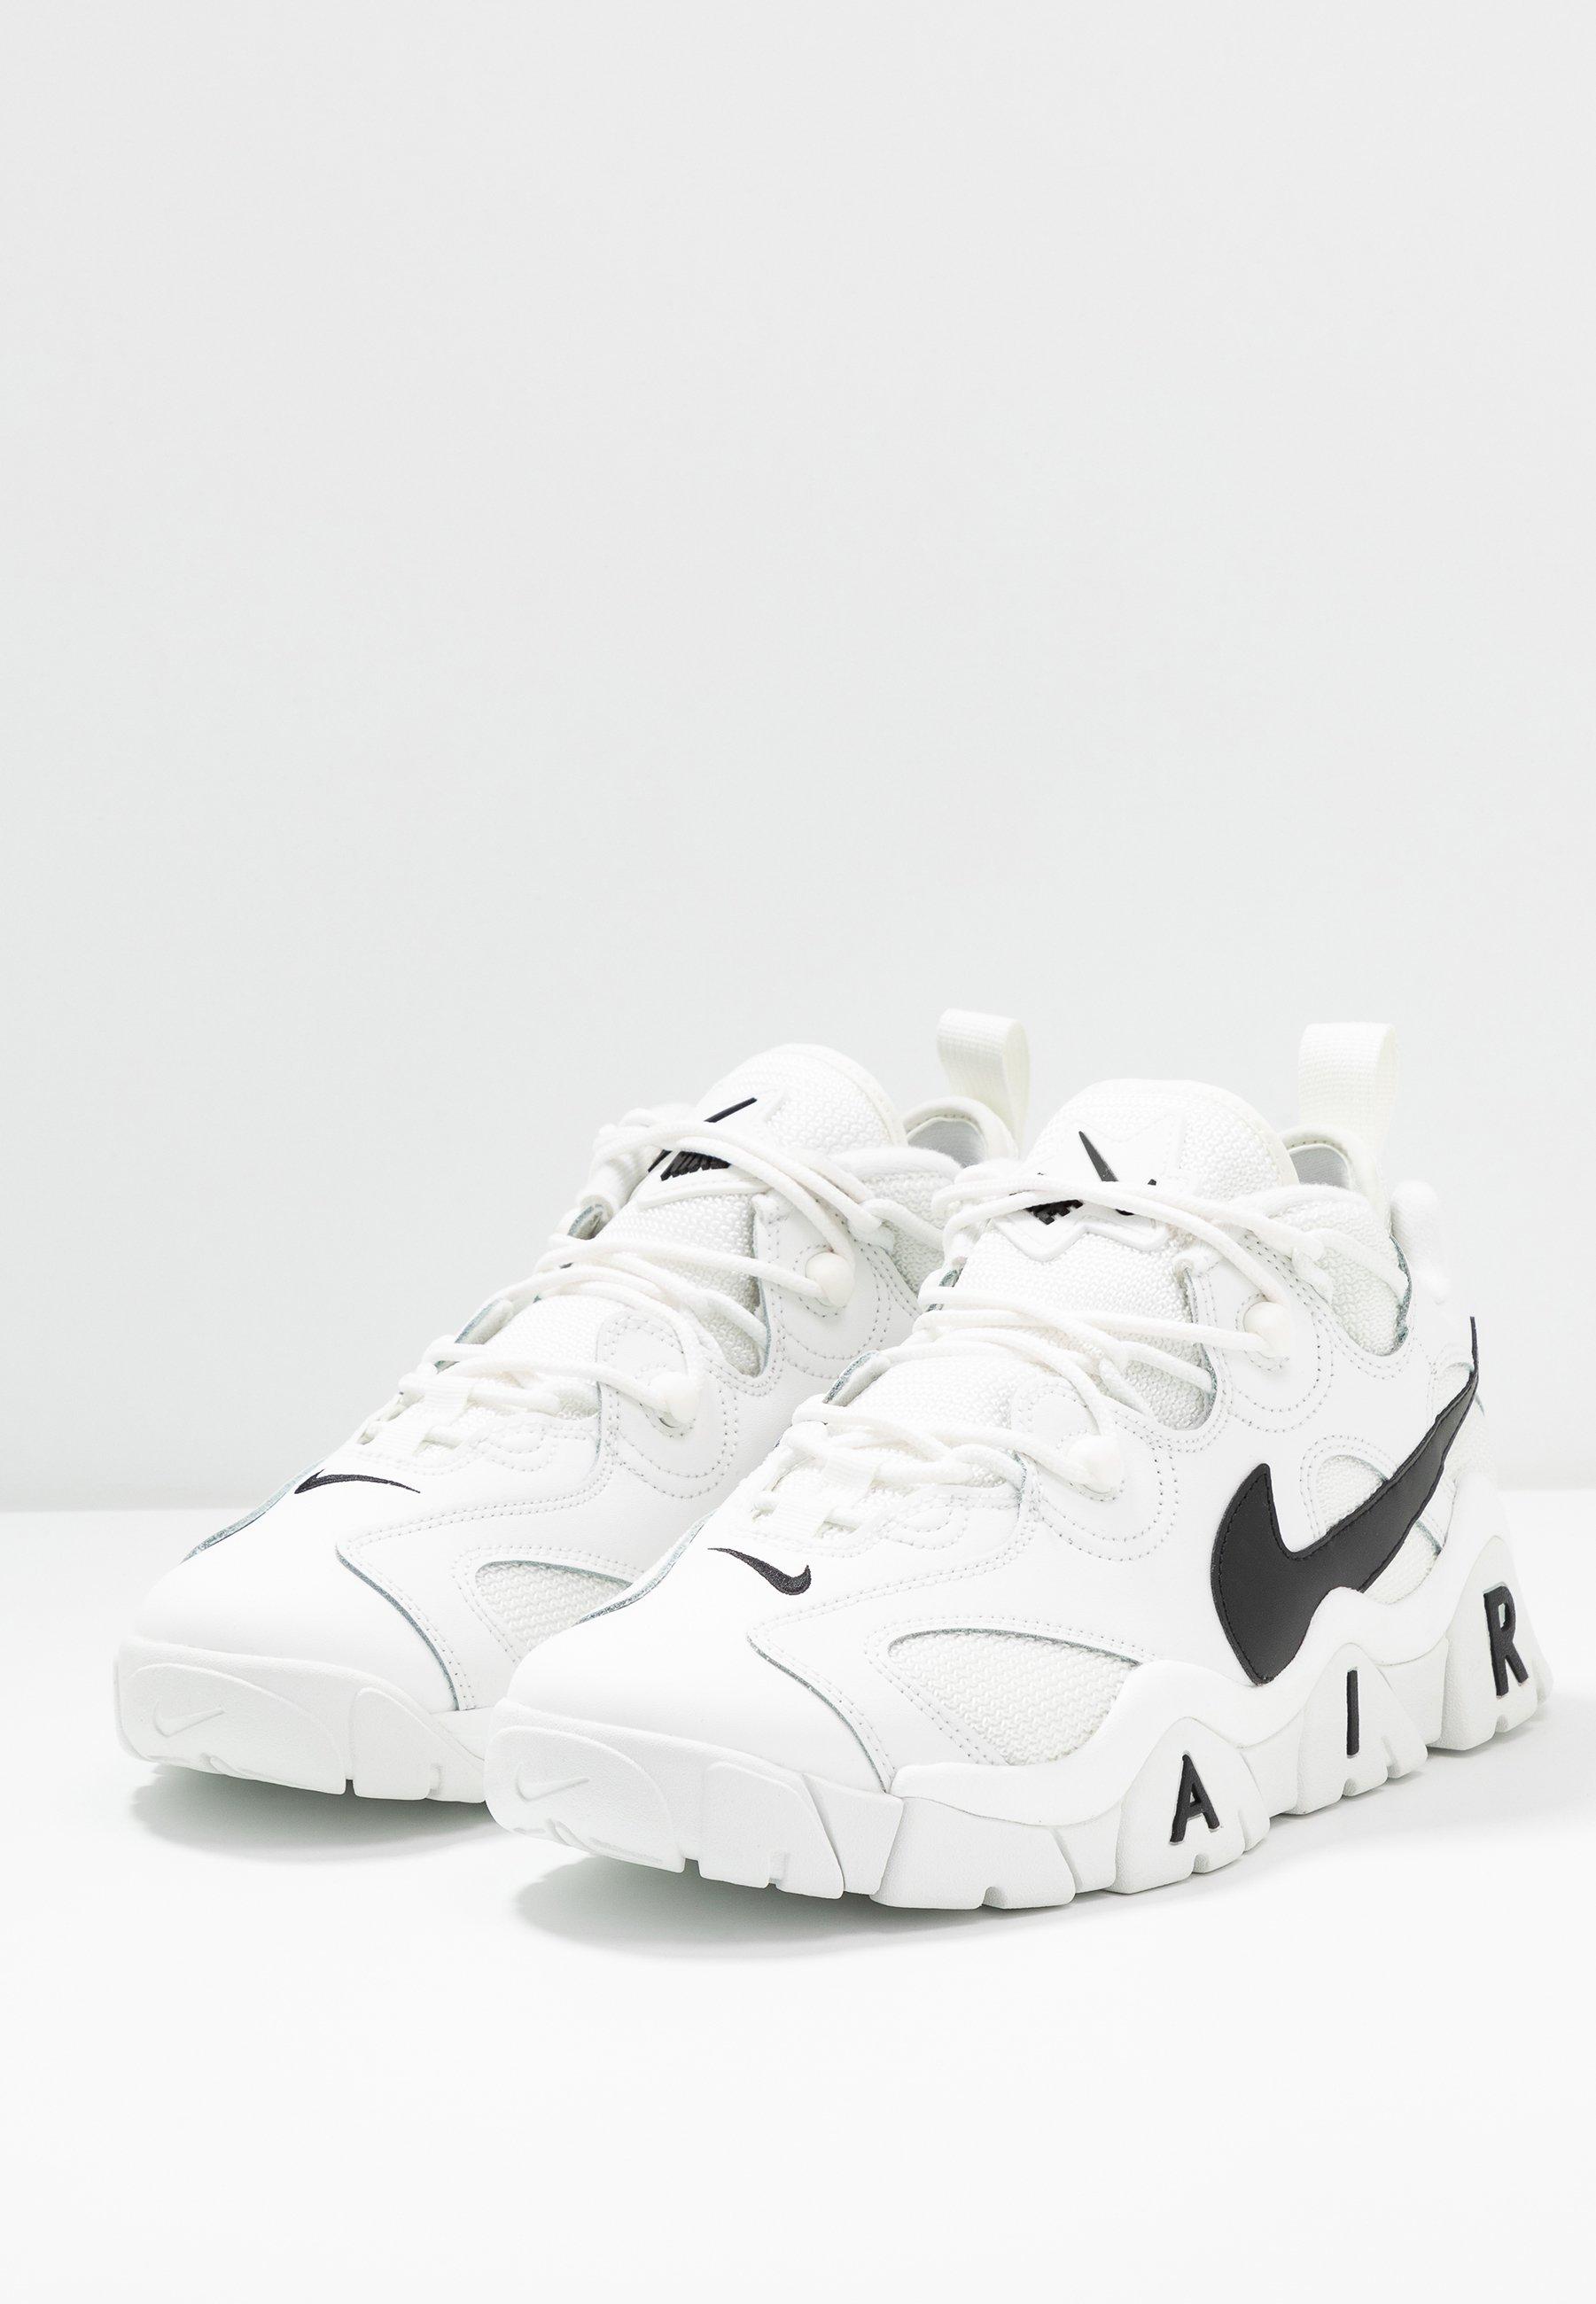 Geringster Preis Nike Sportswear AIR BARRAGE - Sneaker low - summit white/black | Damenbekleidung 2020